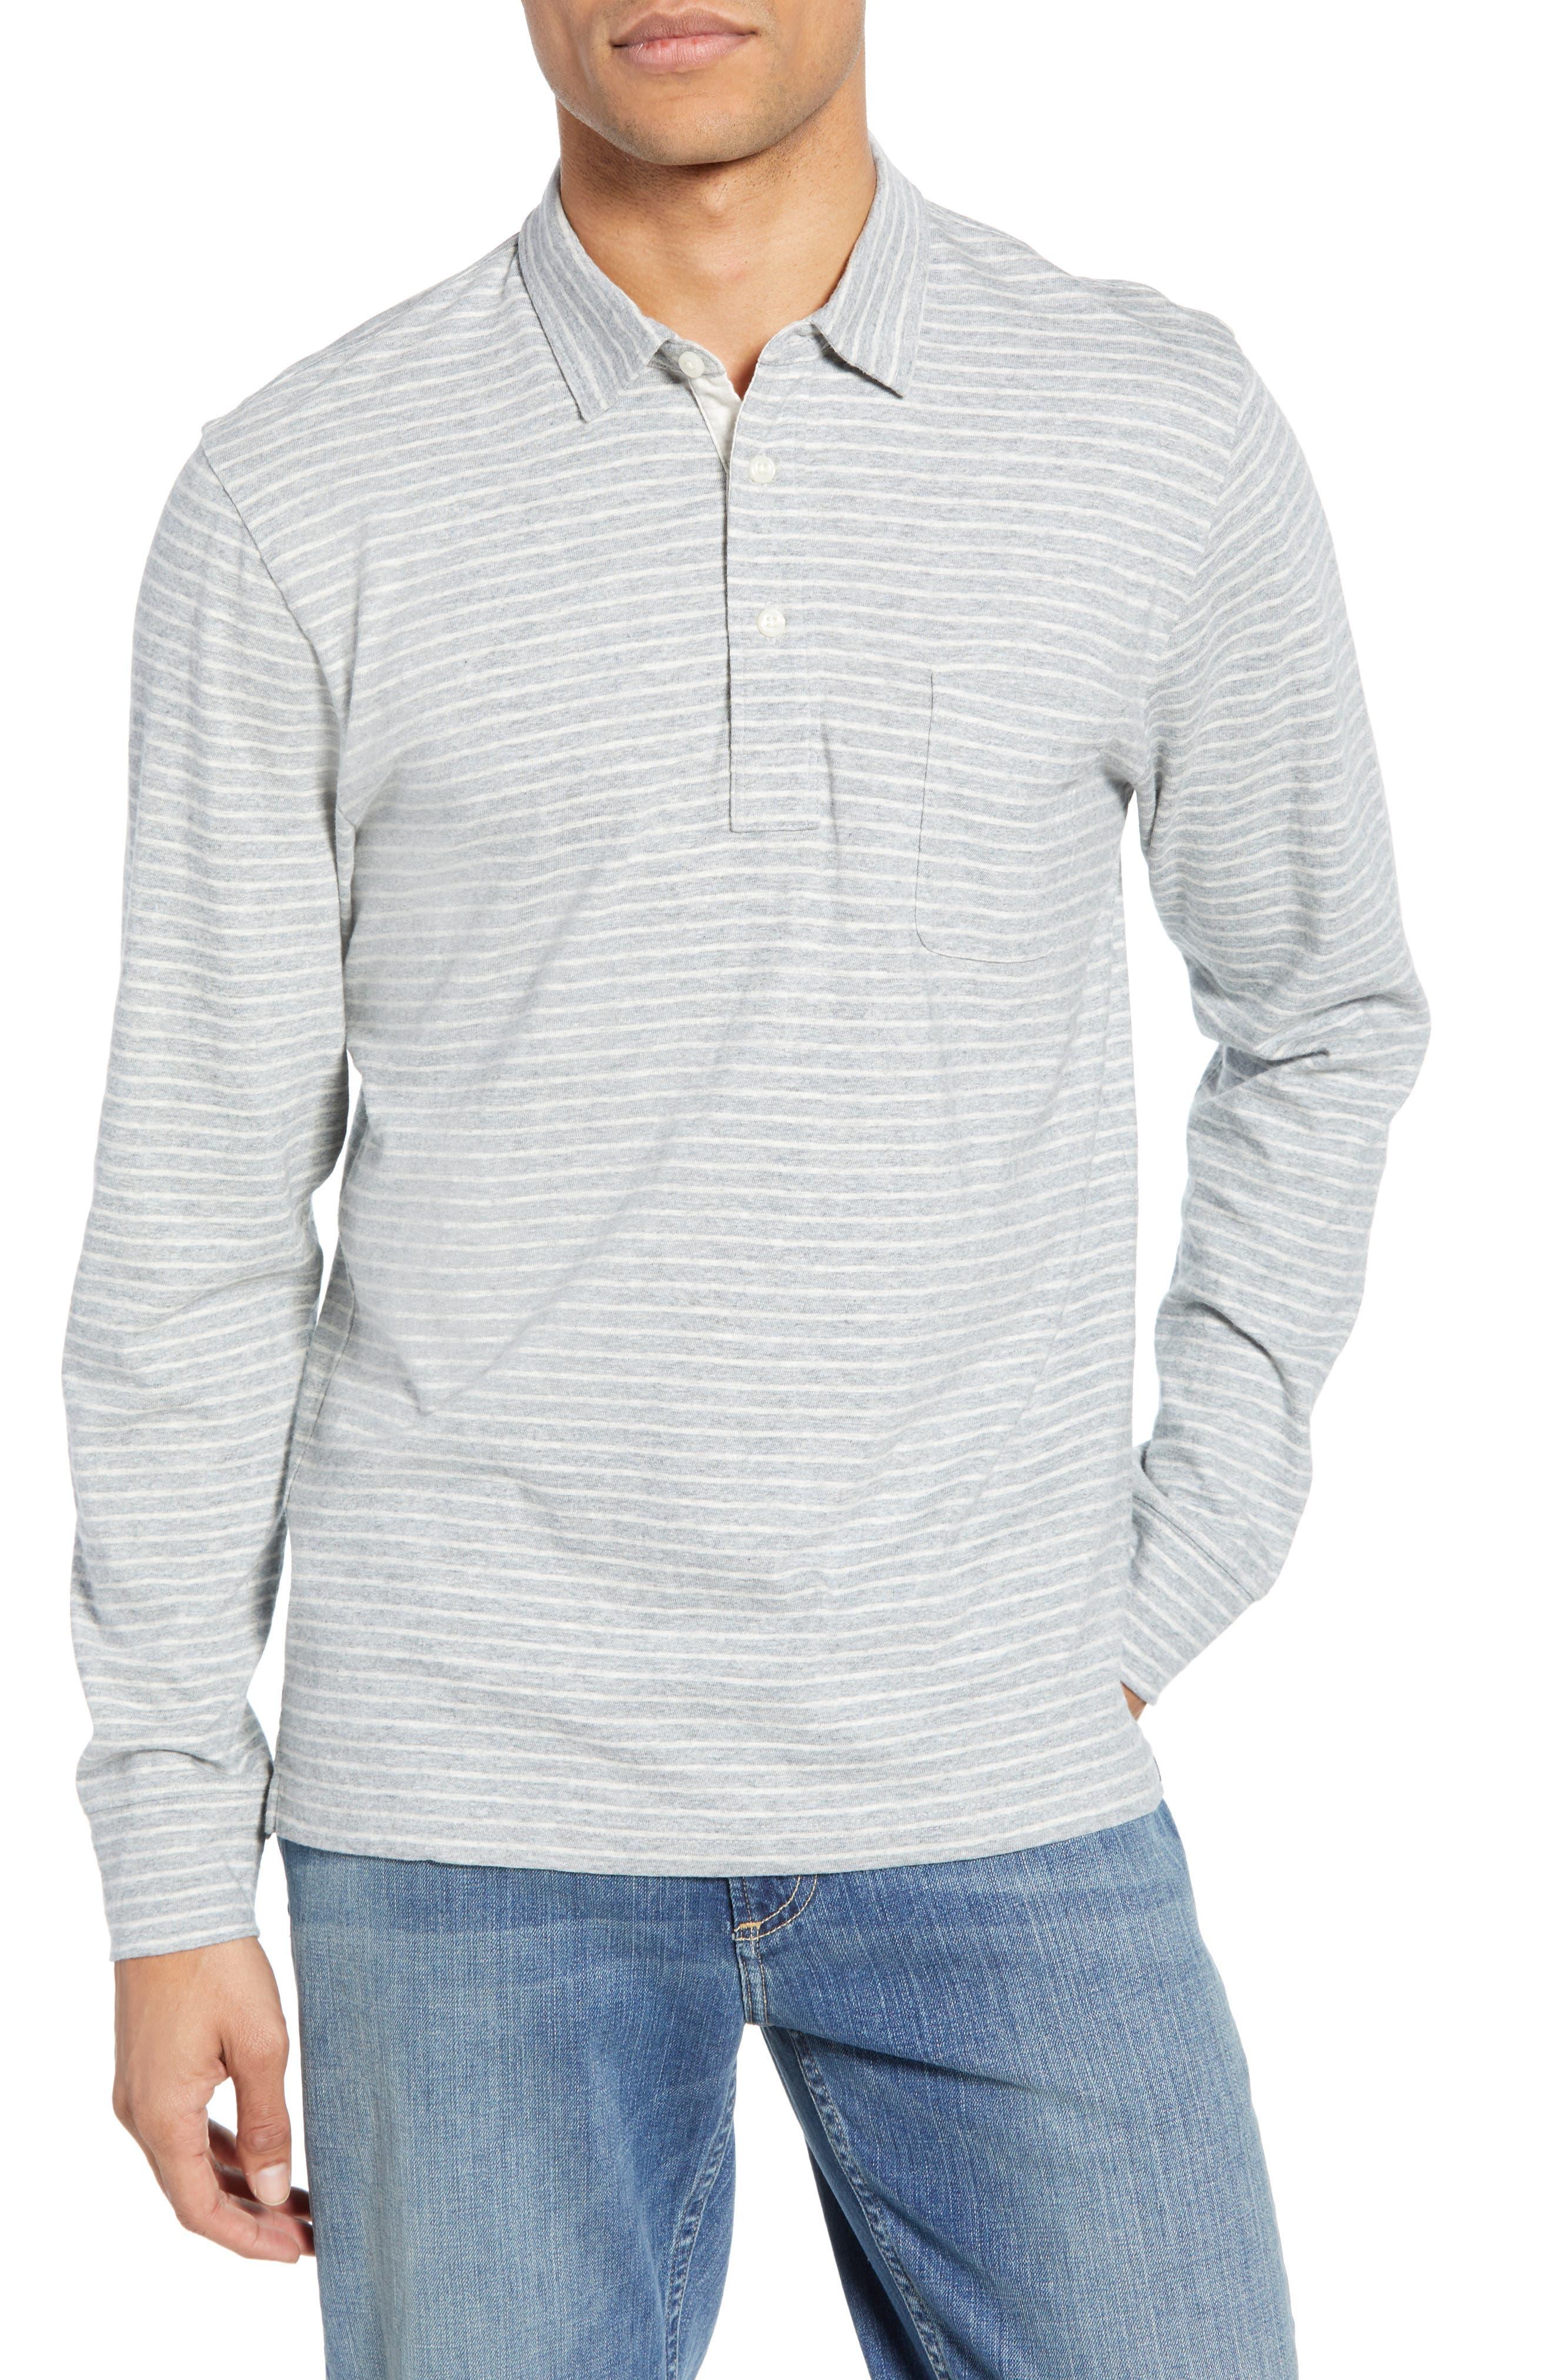 Faherty Bleecker Stripe Long Sleeve Pocket Polo, Grey